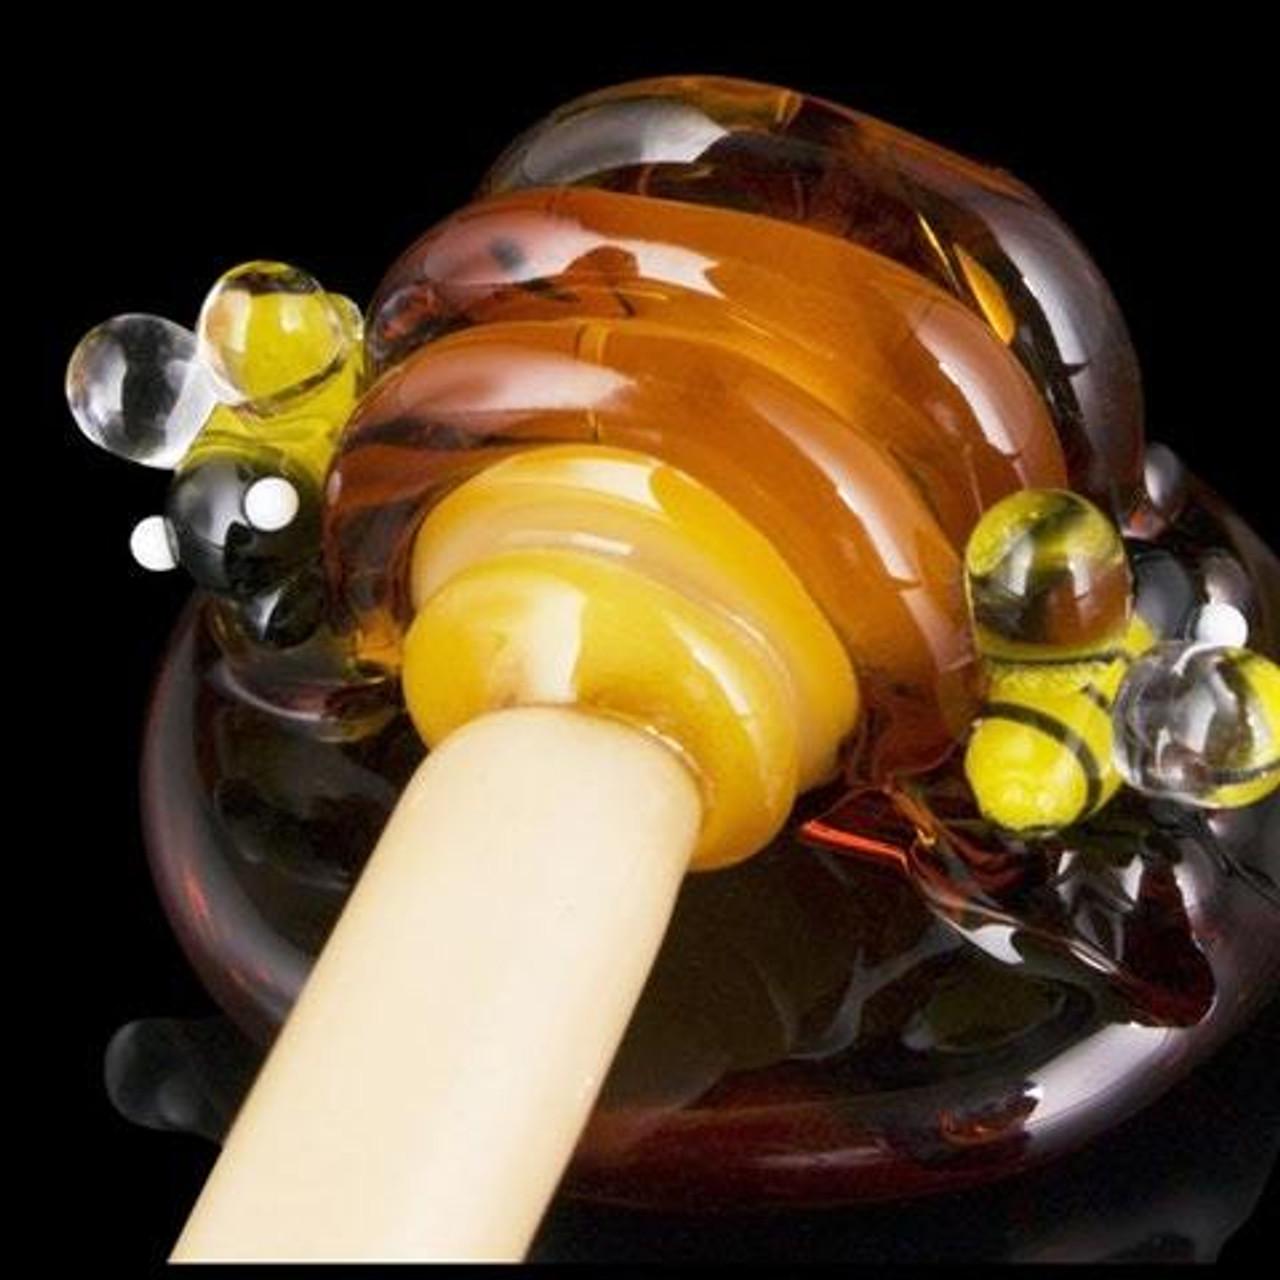 Empire Glassworks - Dabber - Honey Comb